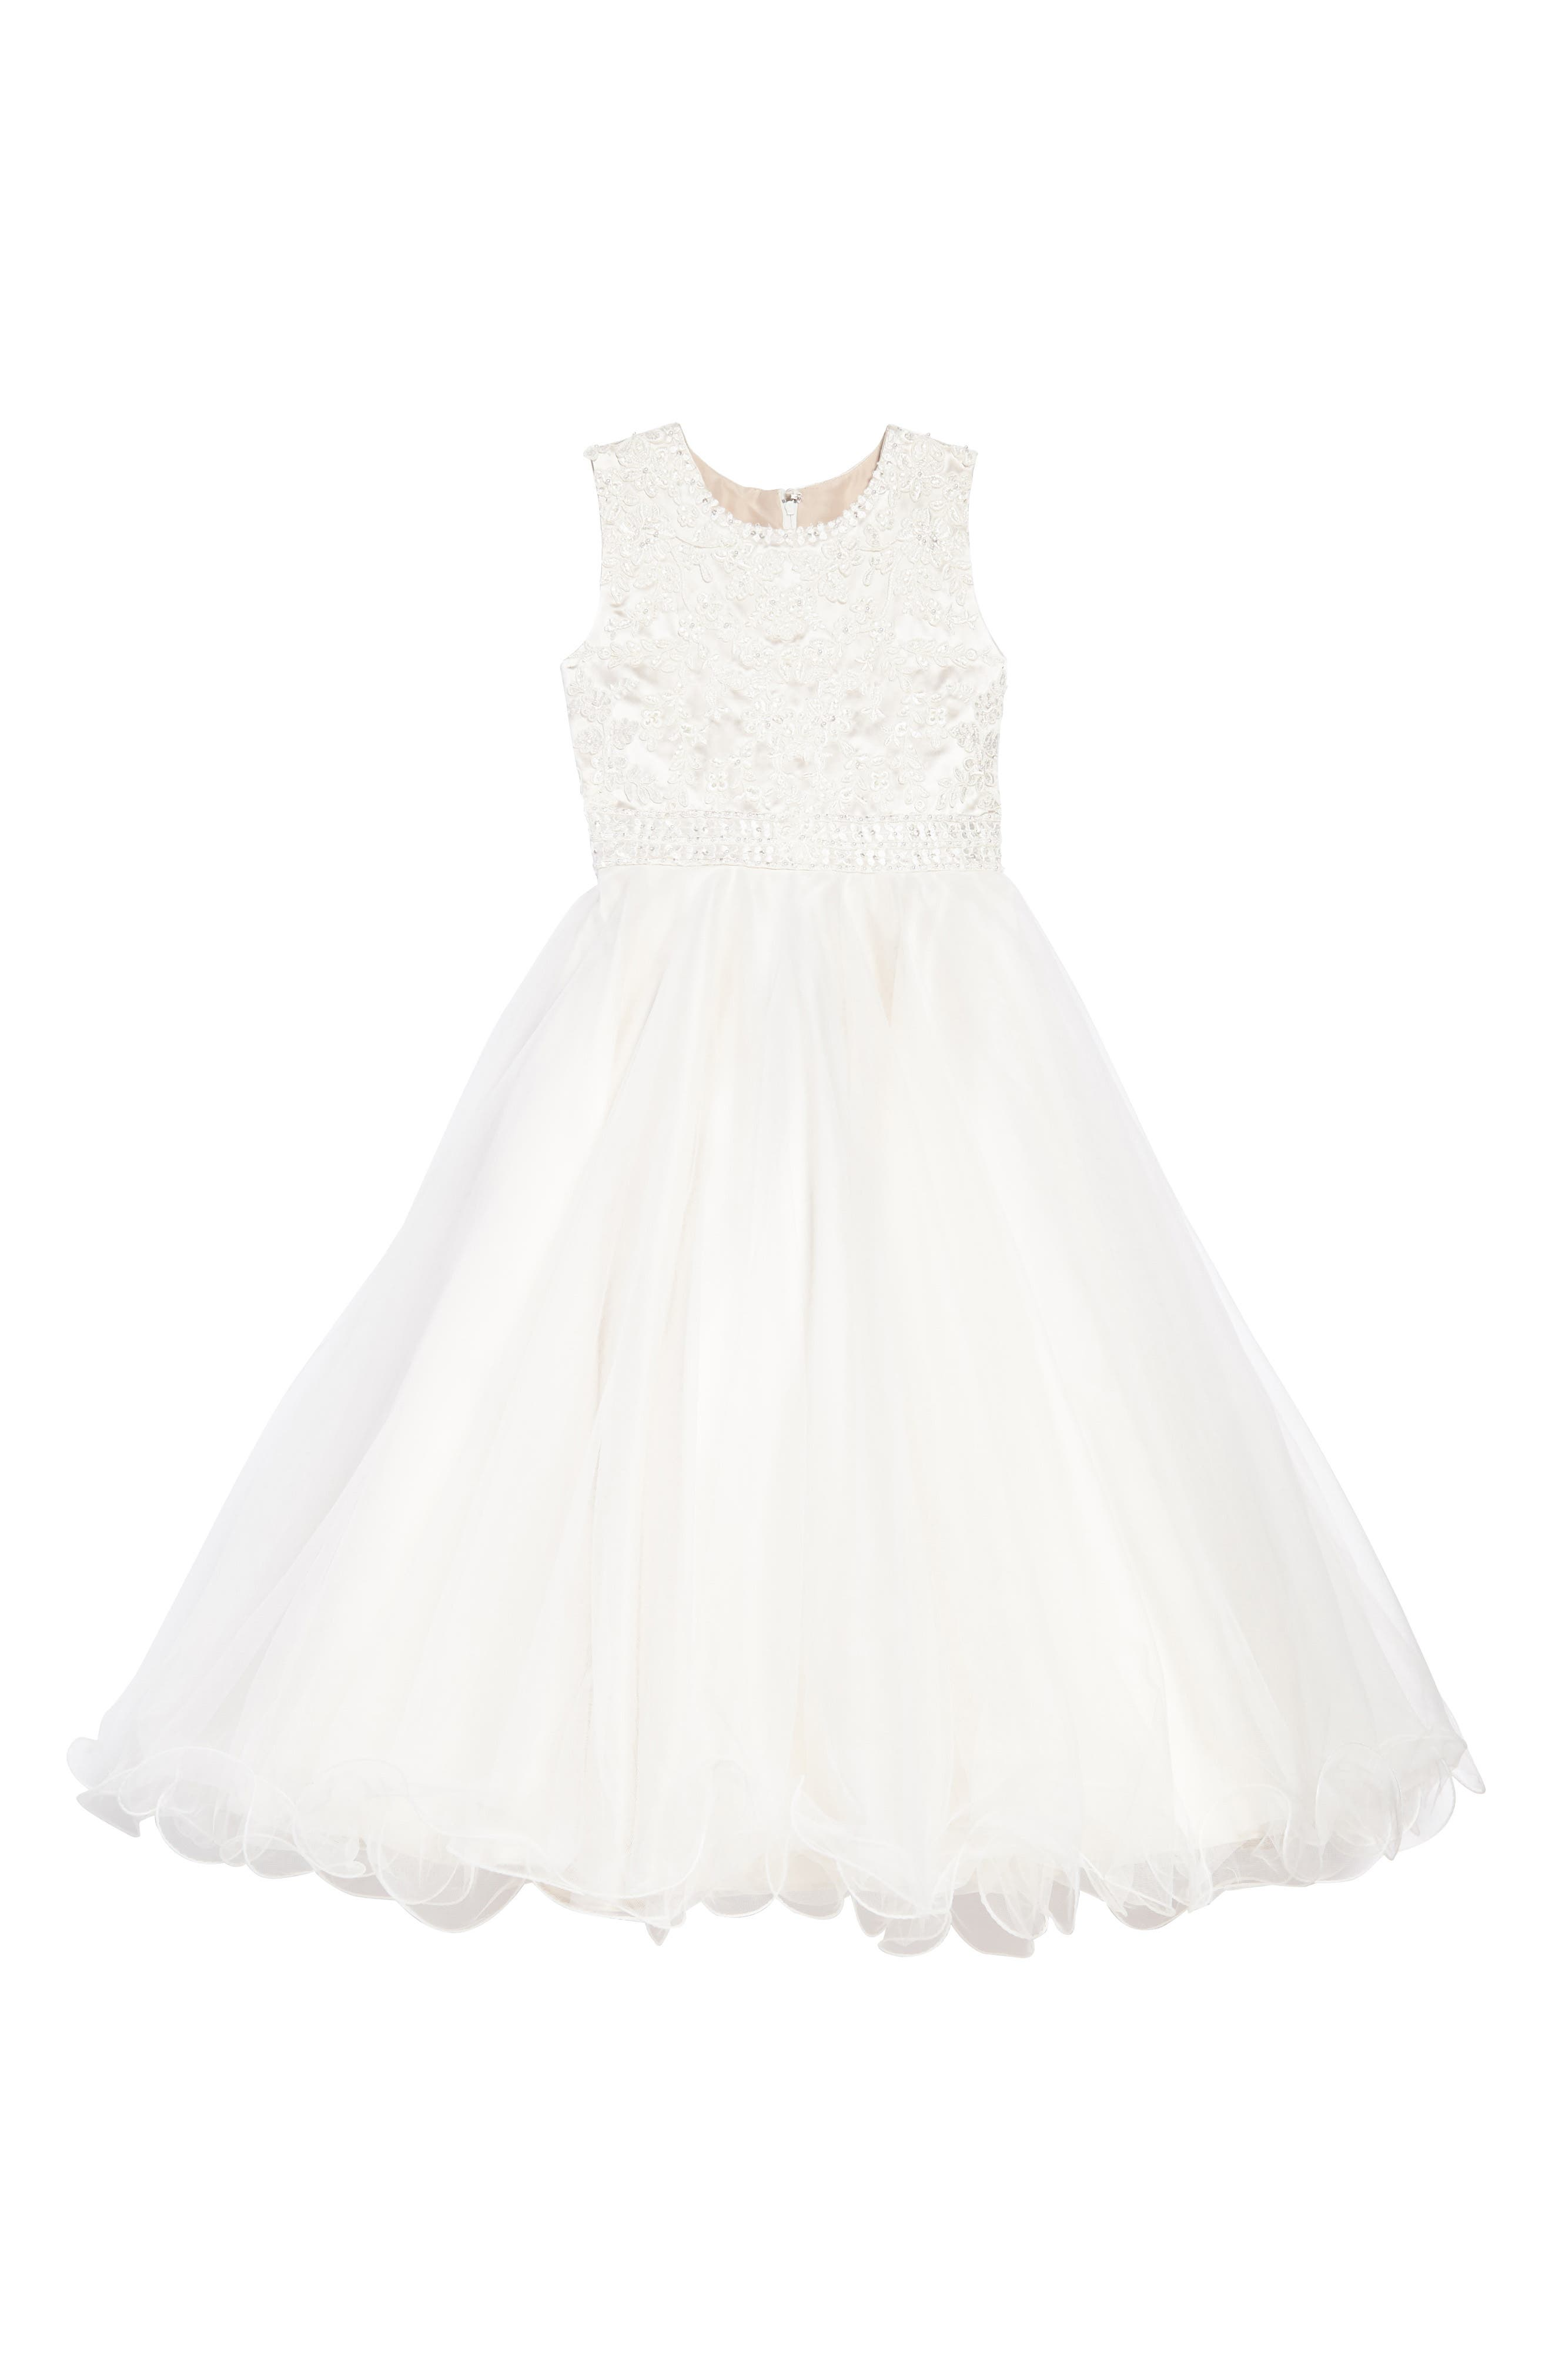 Lace & Tulle Dress,                             Main thumbnail 1, color,                             900